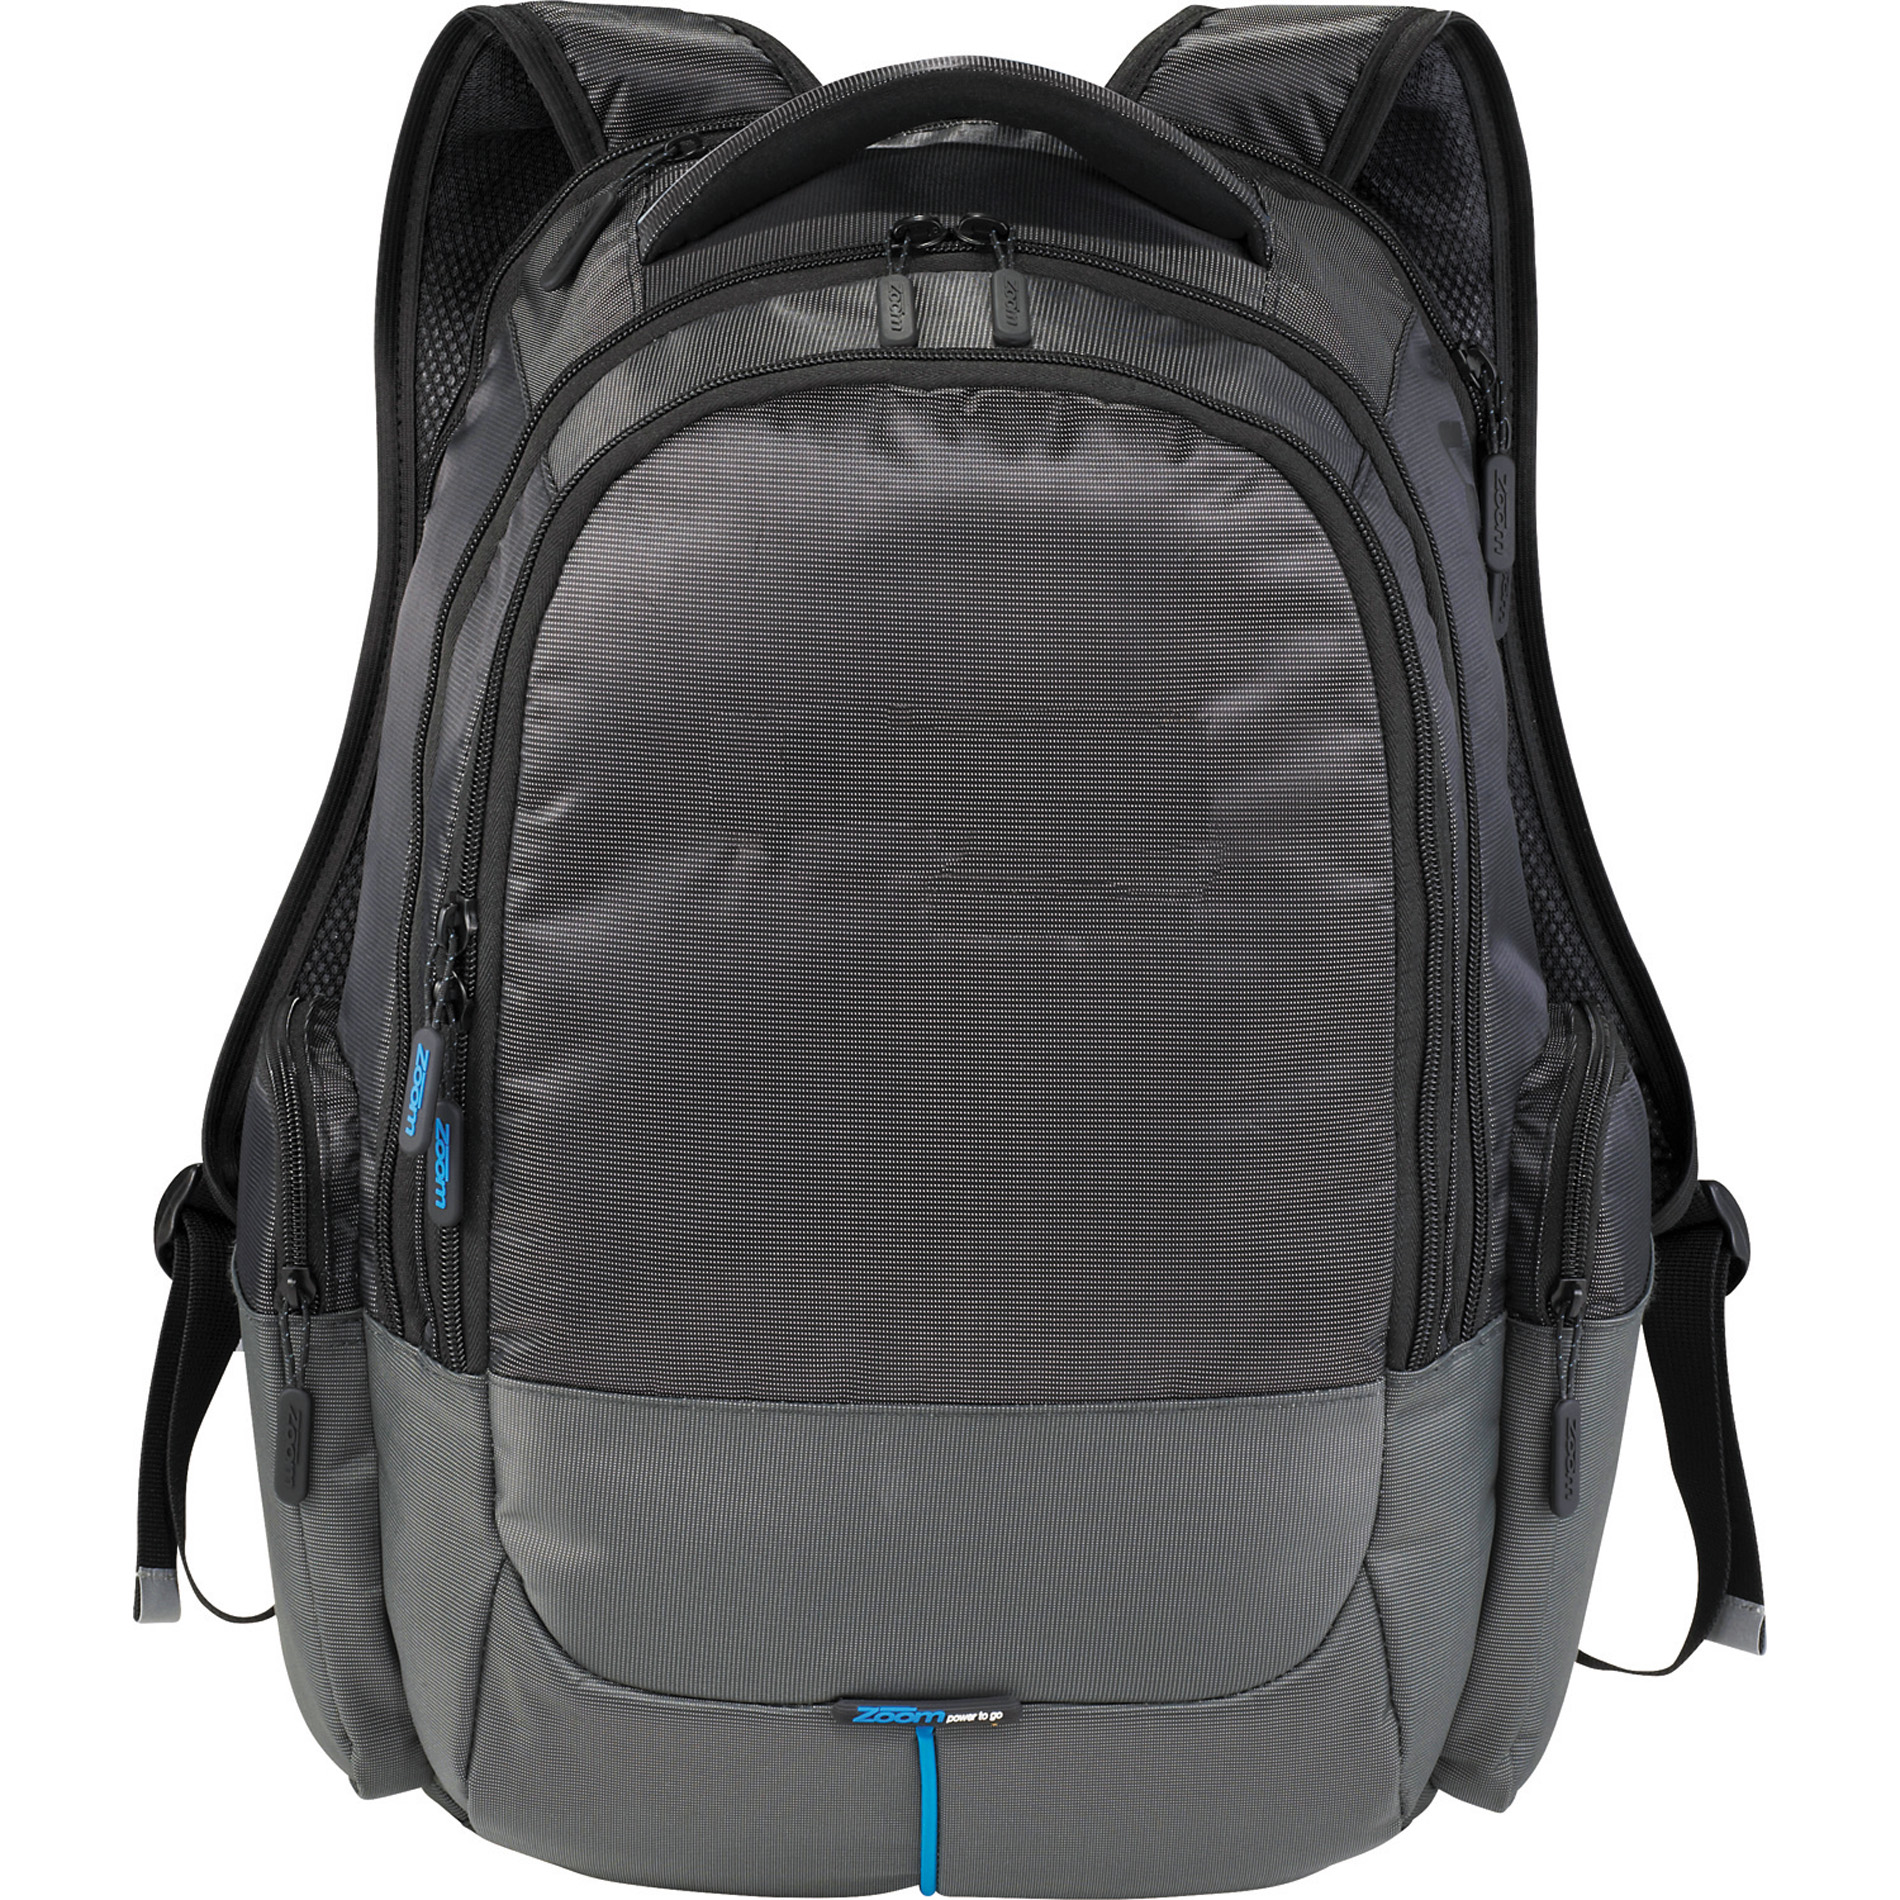 zoom covert security slim 15 computer backpack